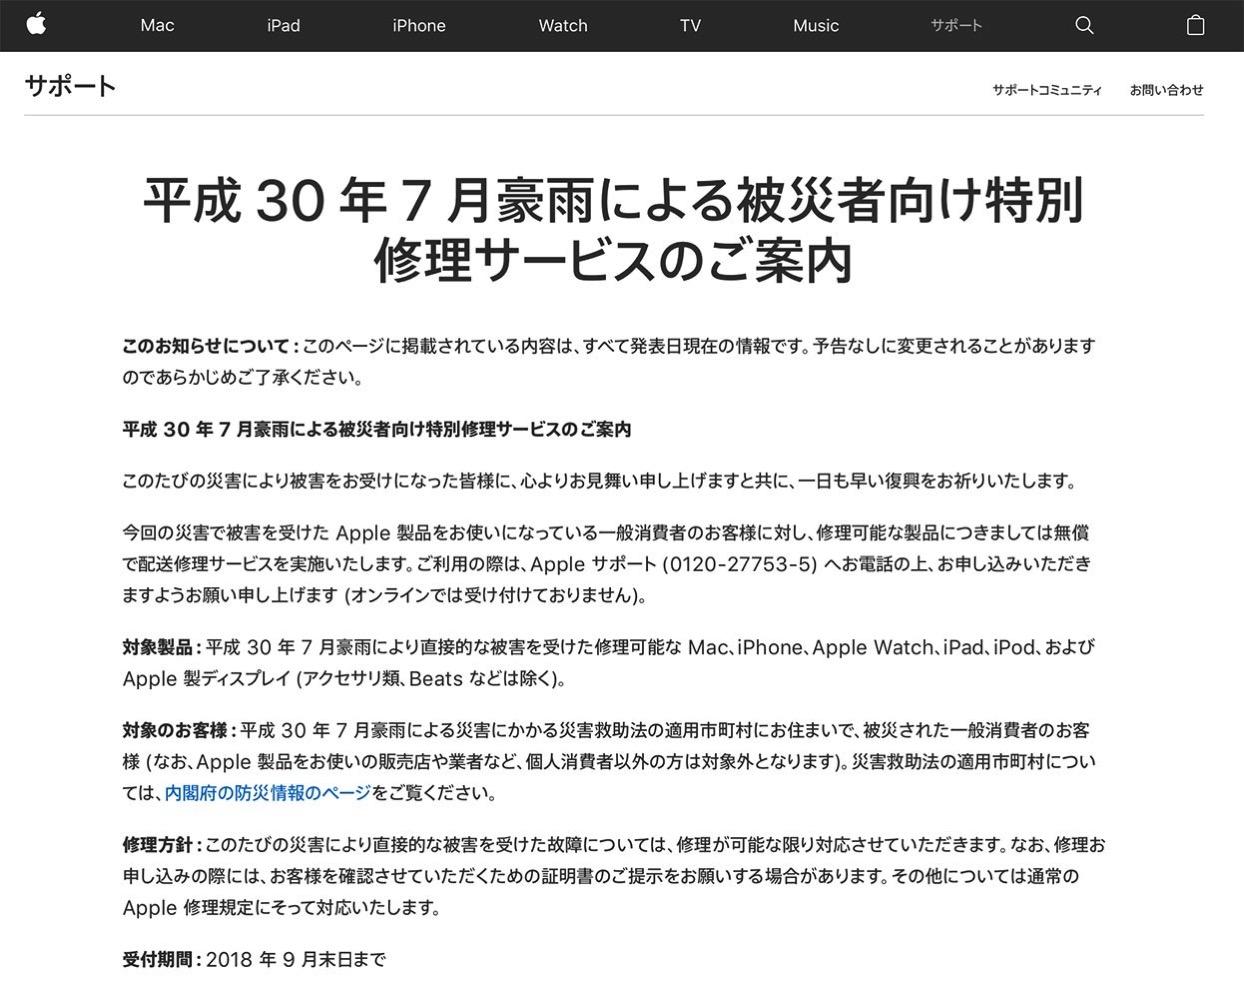 Apple、「平成30年7月豪雨による被災者向け特別修理サービス」を実施すると発表